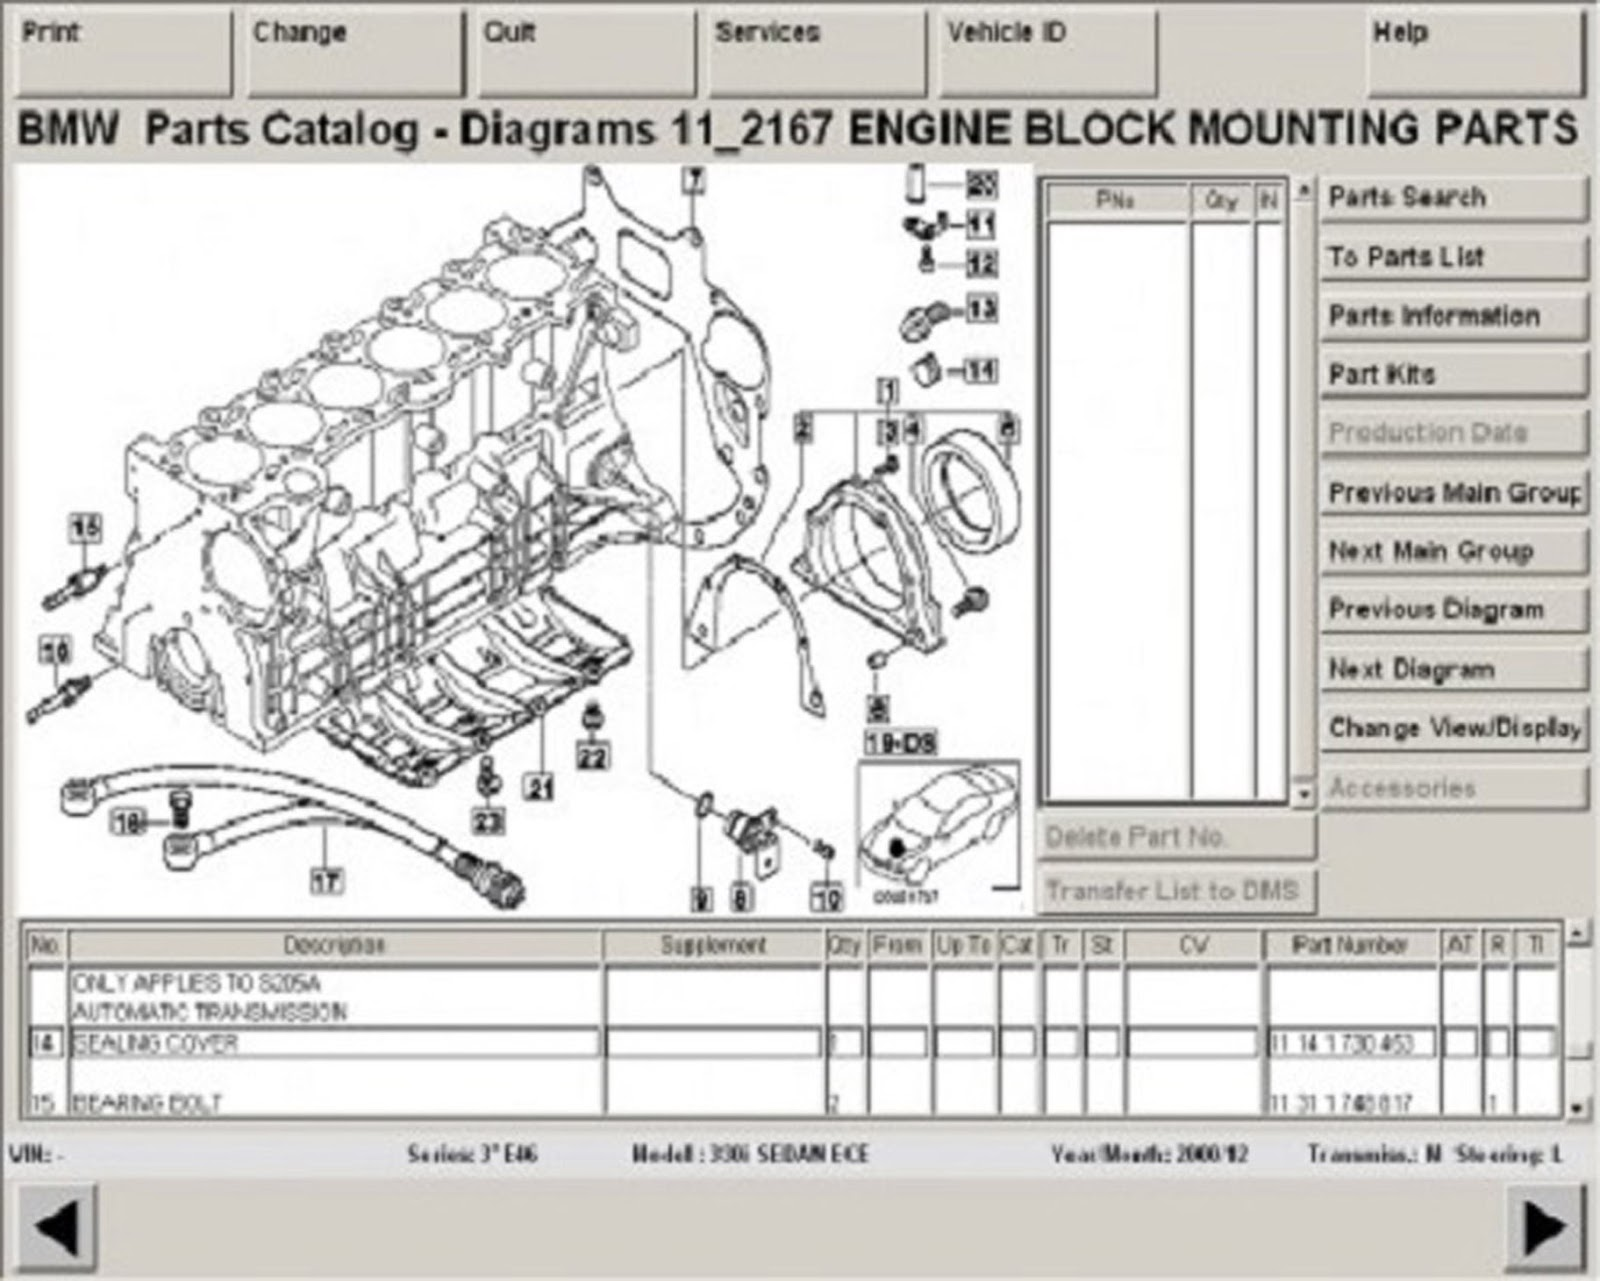 bmw workshop service repair manuals tis wds epc etk etm obd2 jombang electrical wiring diagram  [ 1600 x 1281 Pixel ]